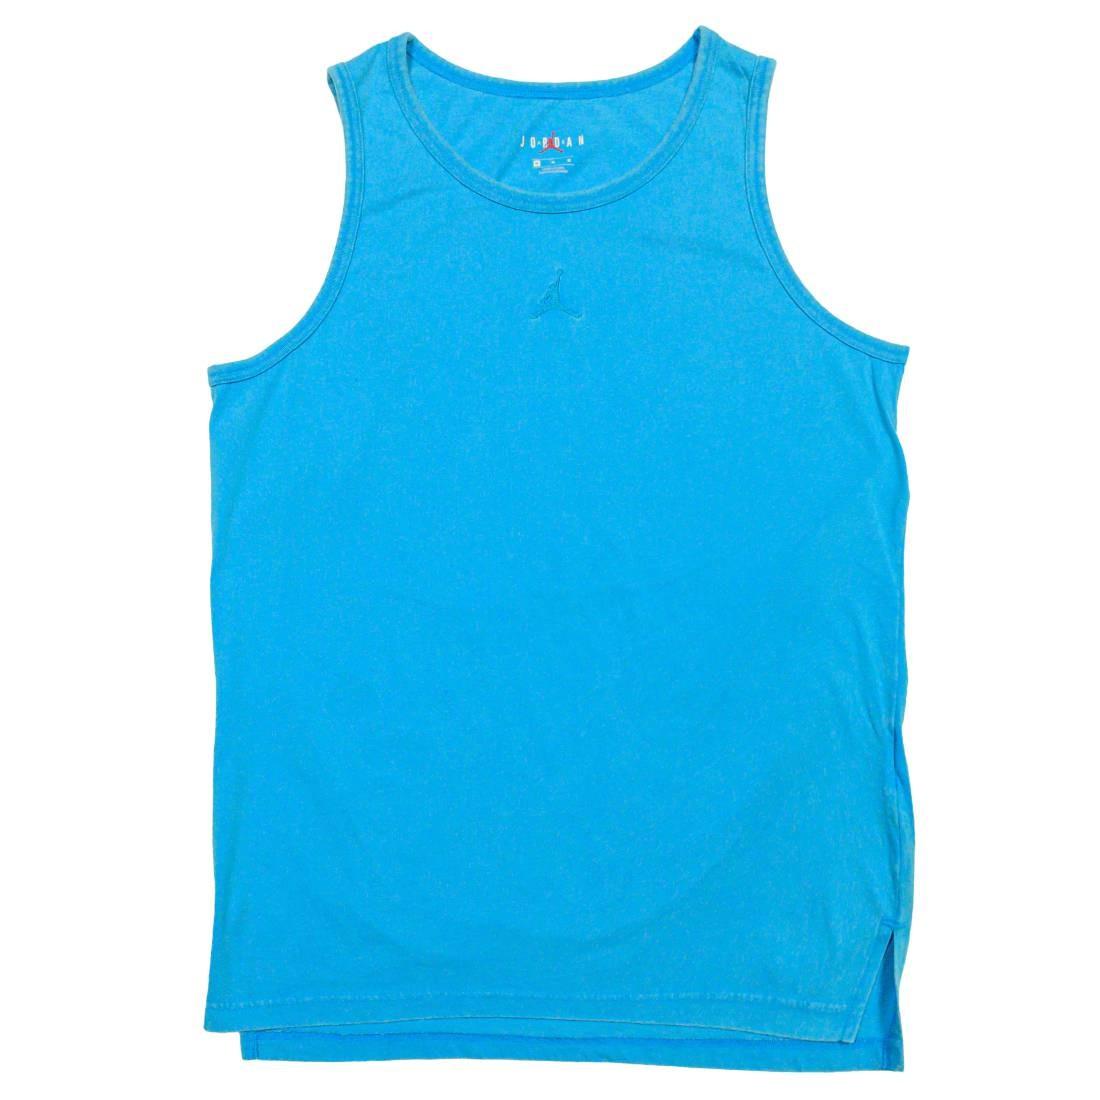 Jordan Men Tank Top (equator blue)